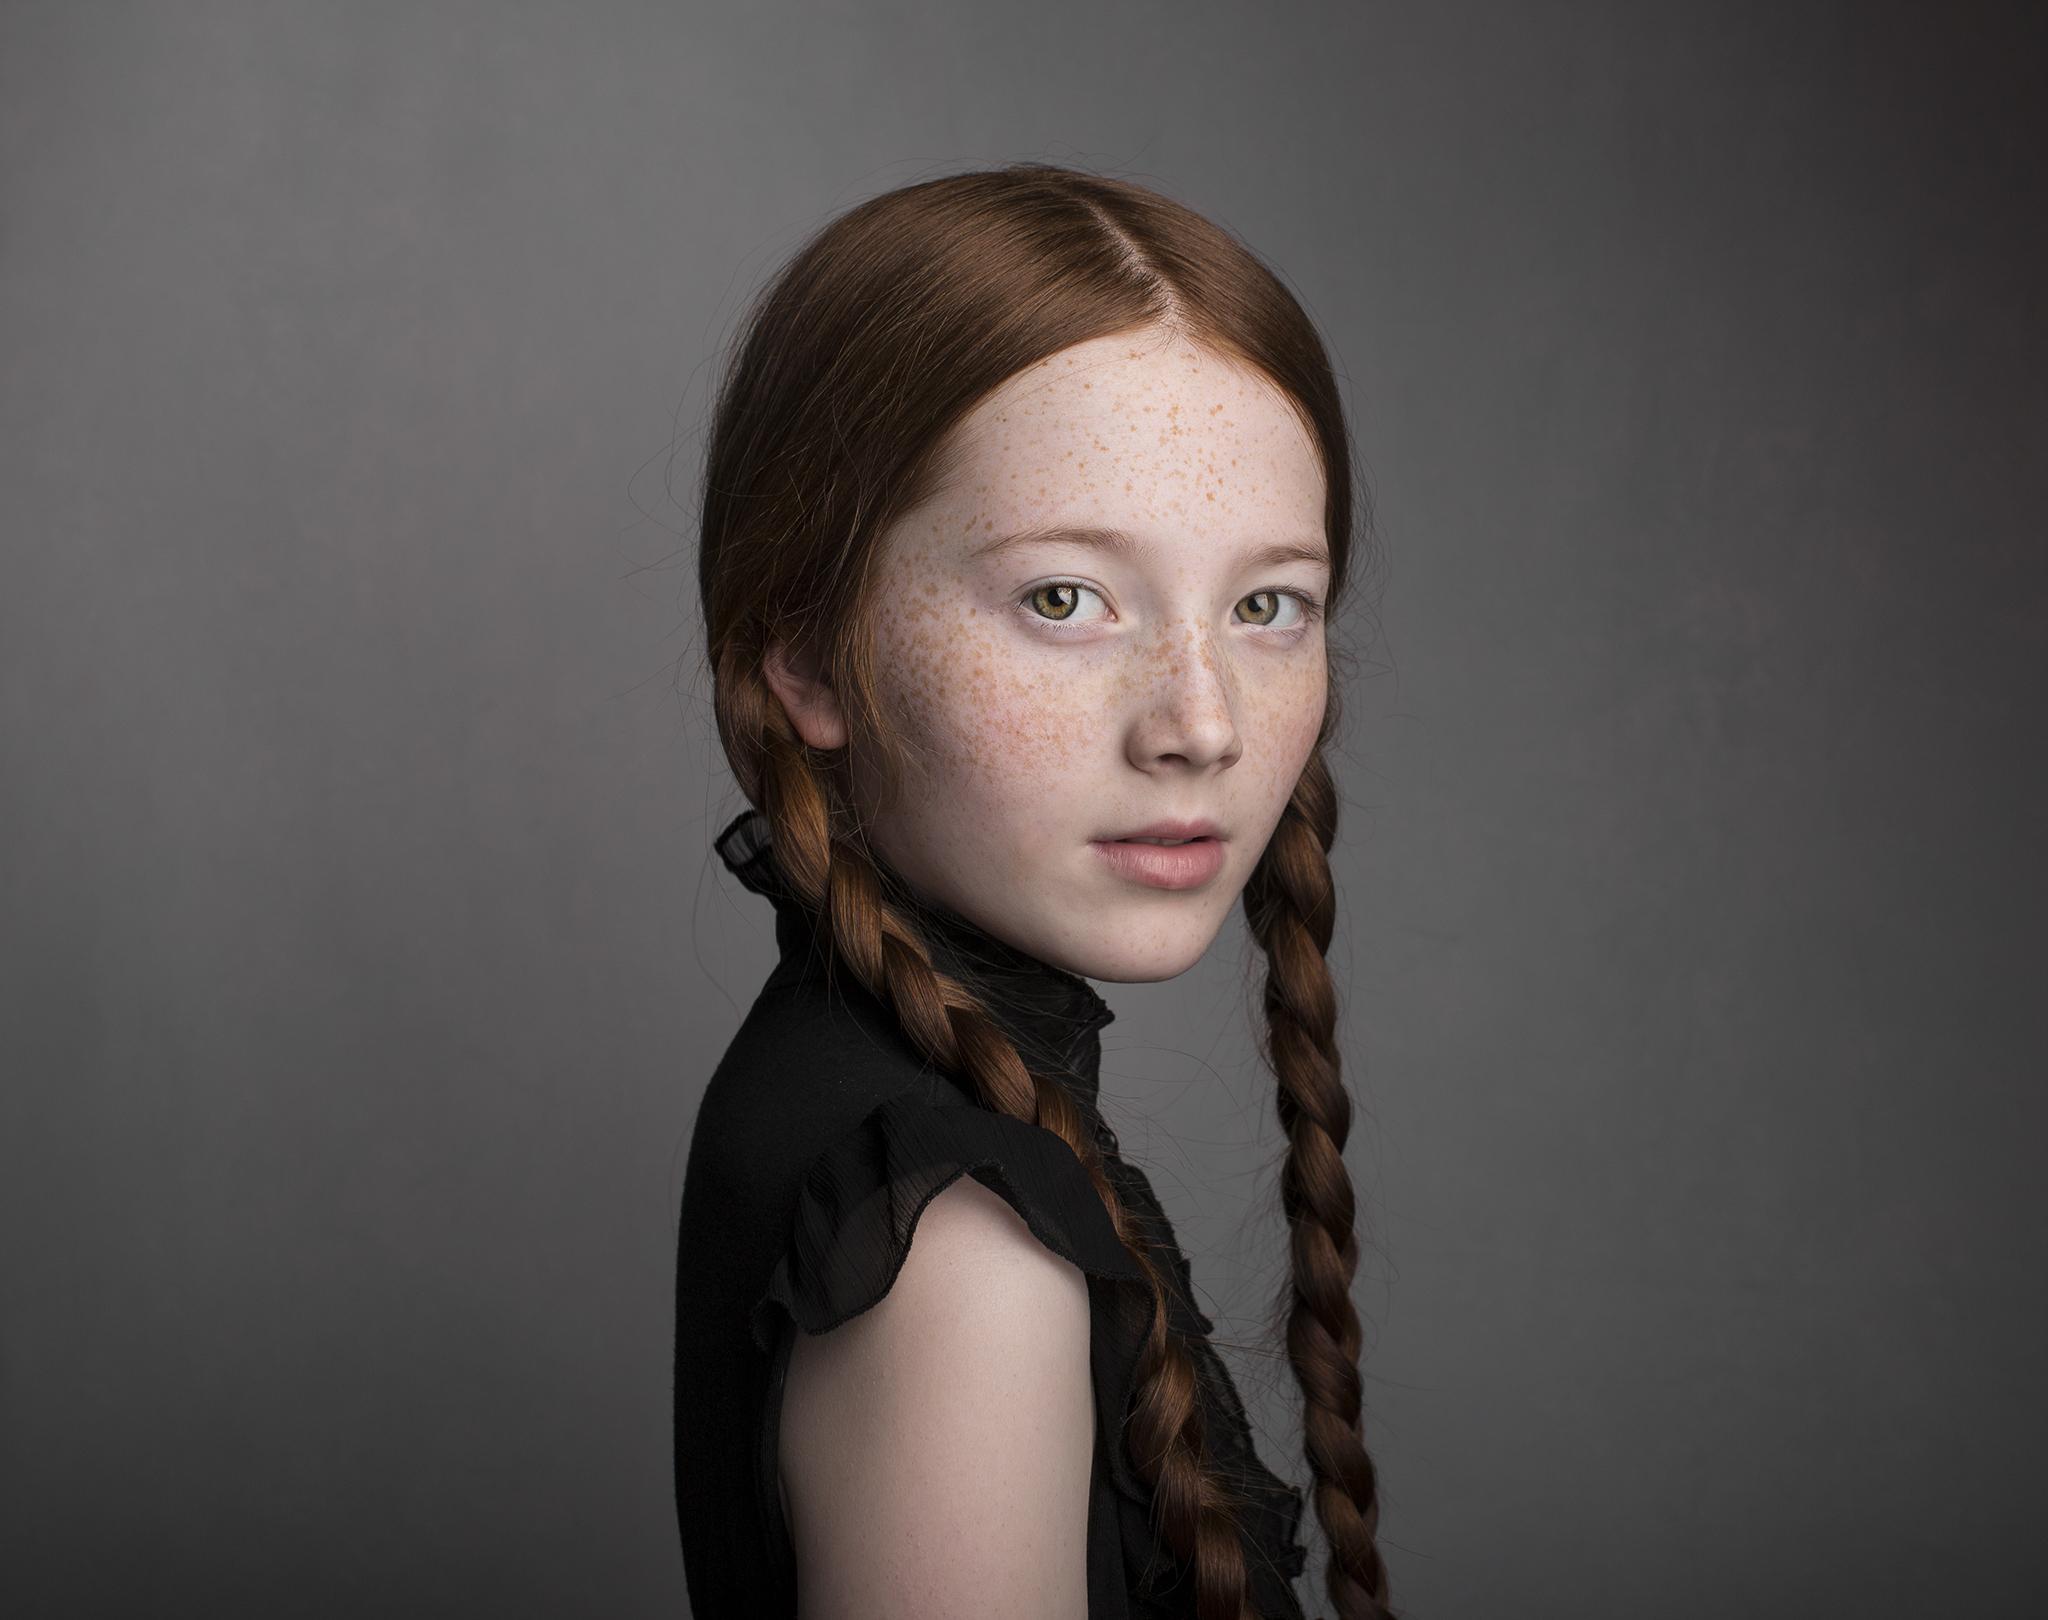 elizabethgphotography_childrens_fineart_kingslangley_hertfordshire_model_lilycave_1.jpg